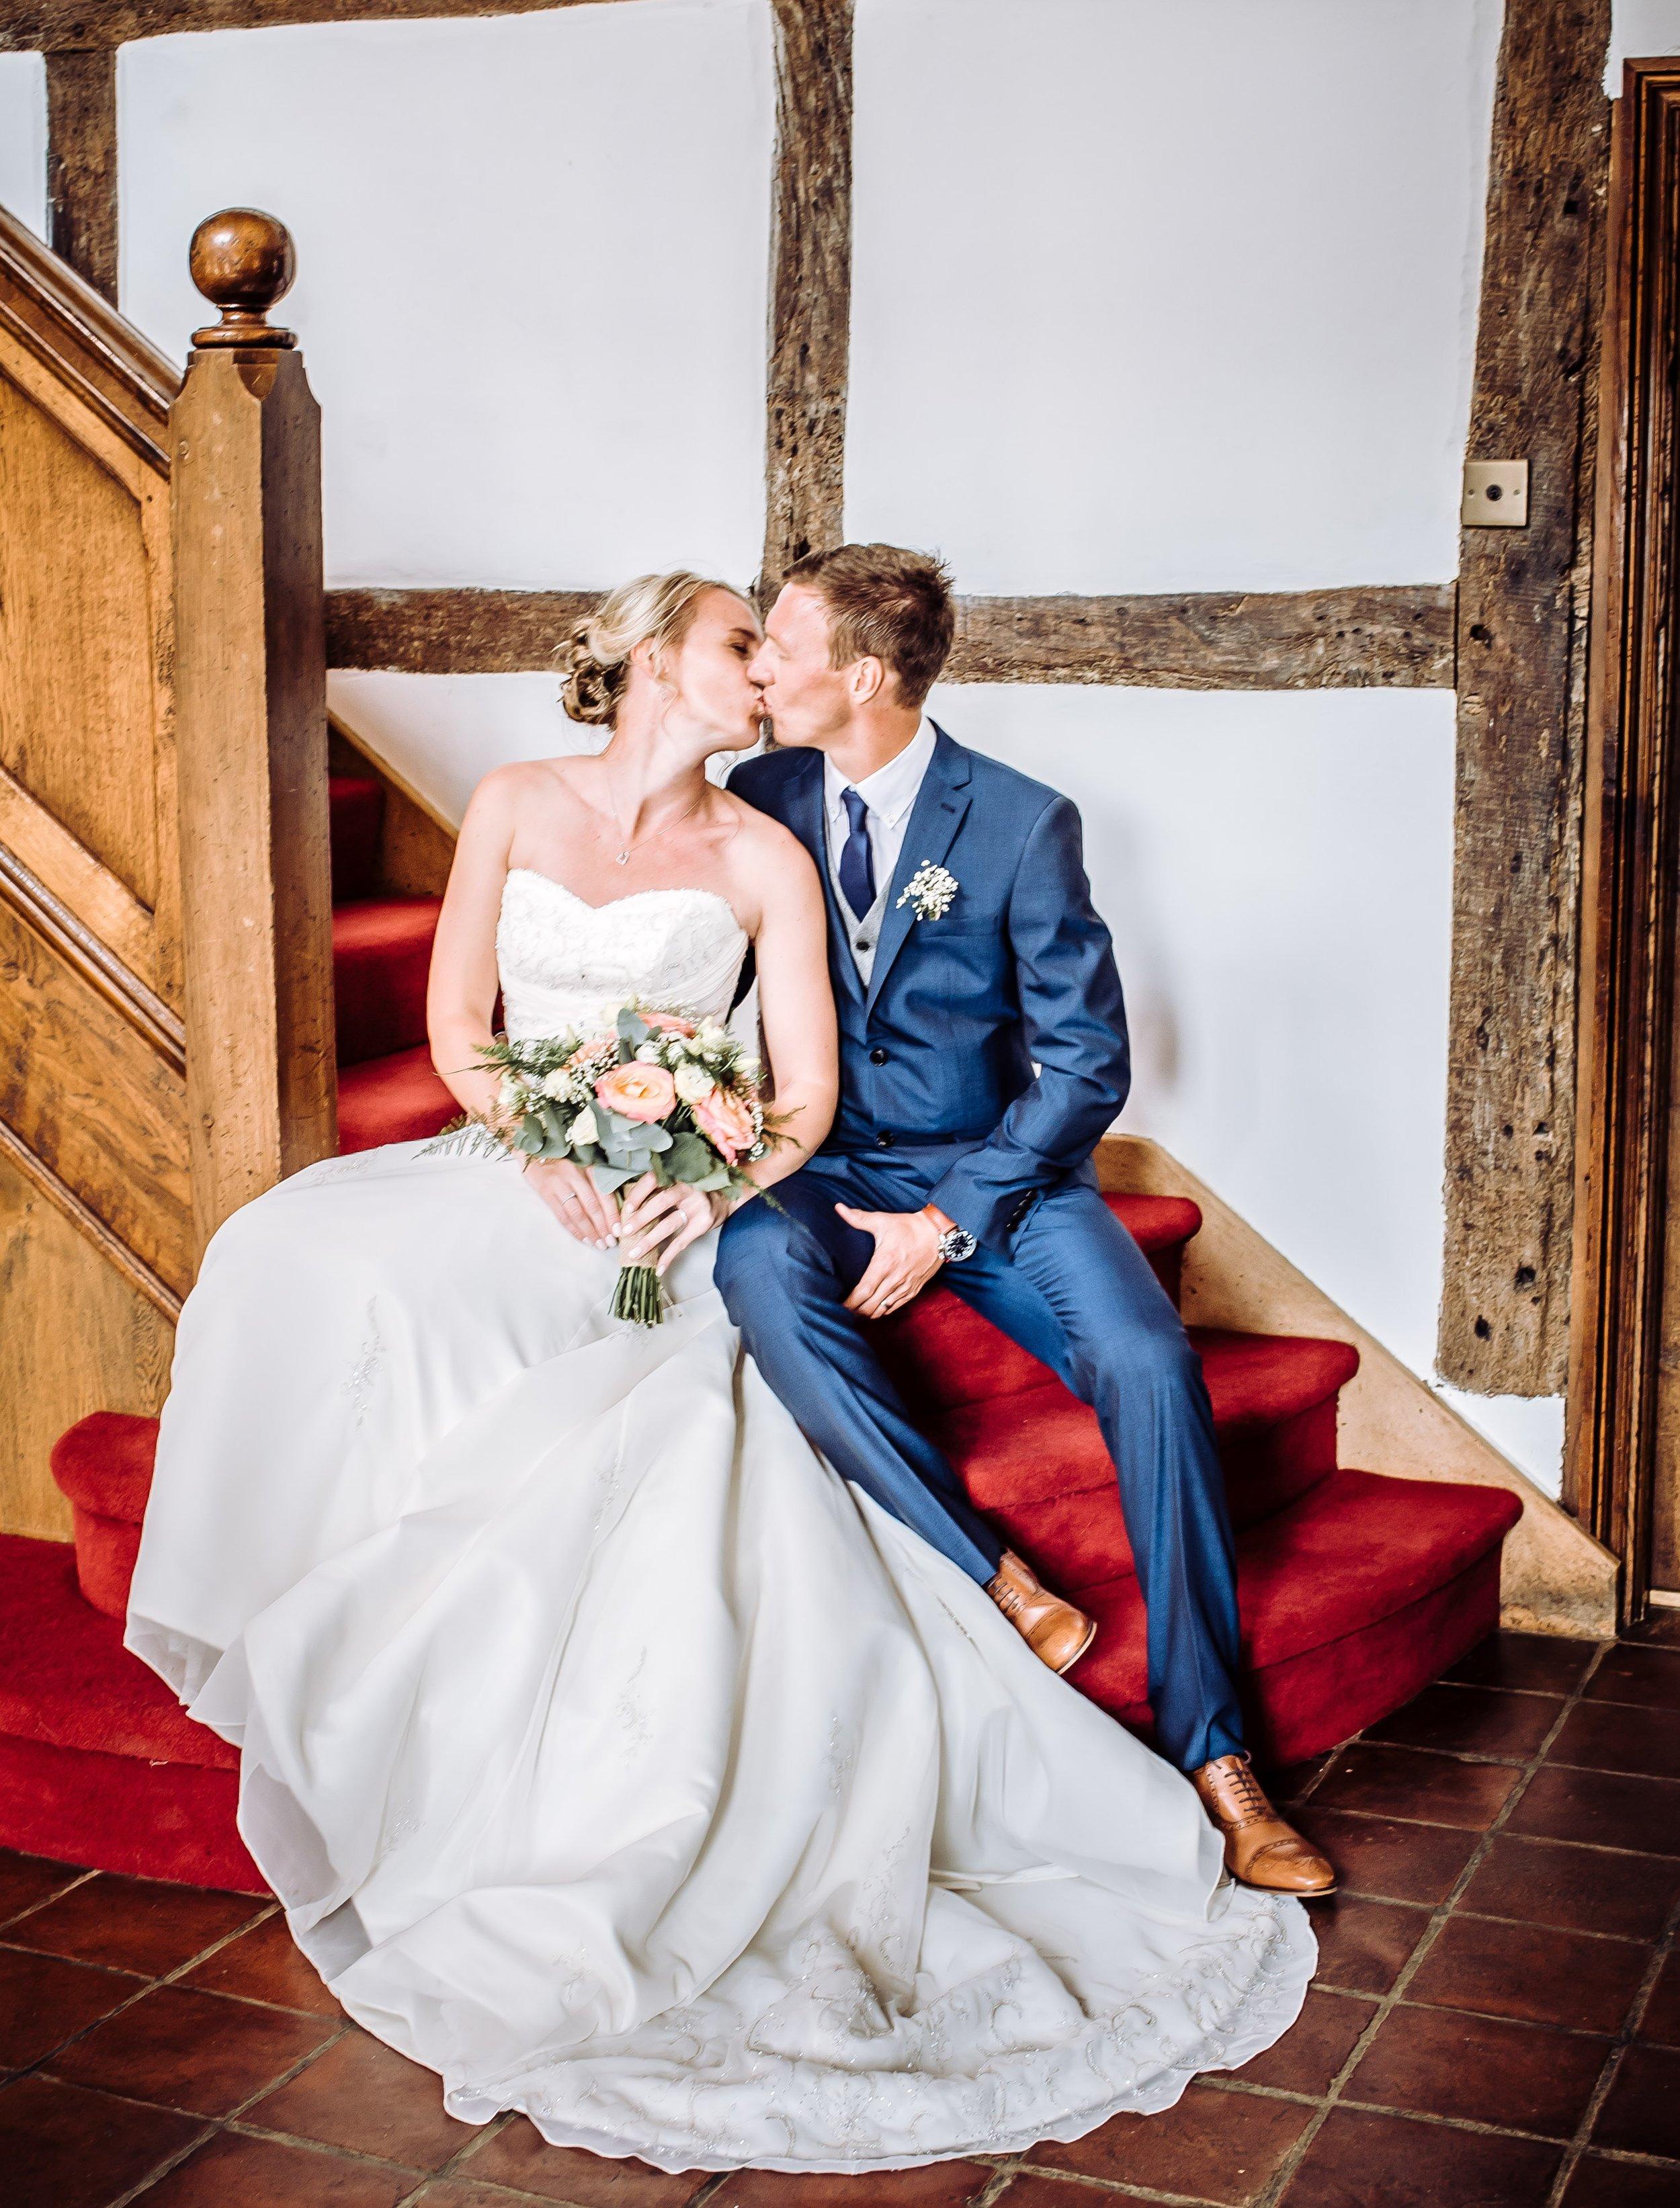 Vintage Wedding - East Sussex Wedding Photographer_0065.jpg